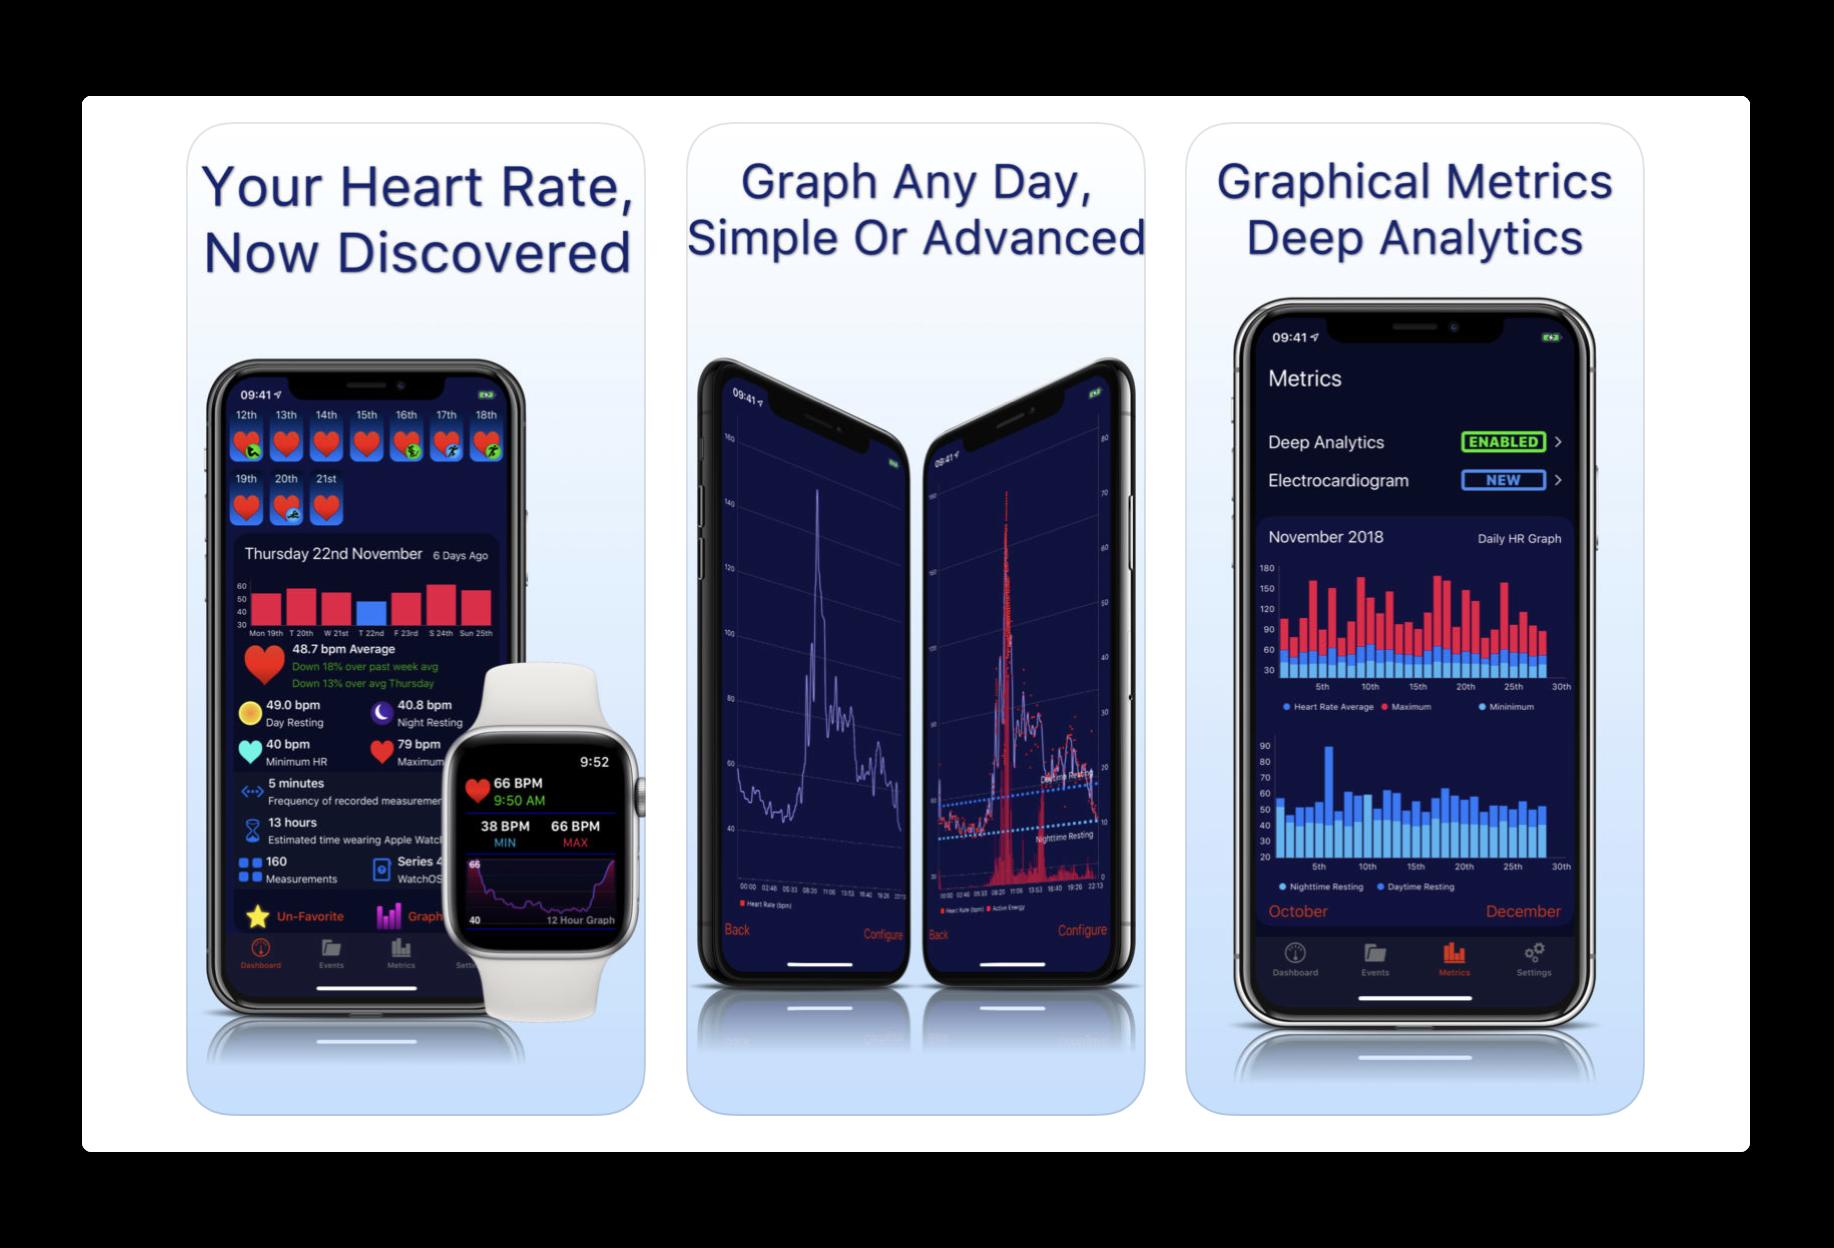 【Apple Watch】「Heart Analyzer」バージョンアップでライブ心拍数とseries 4のコンプリケーションをサポート